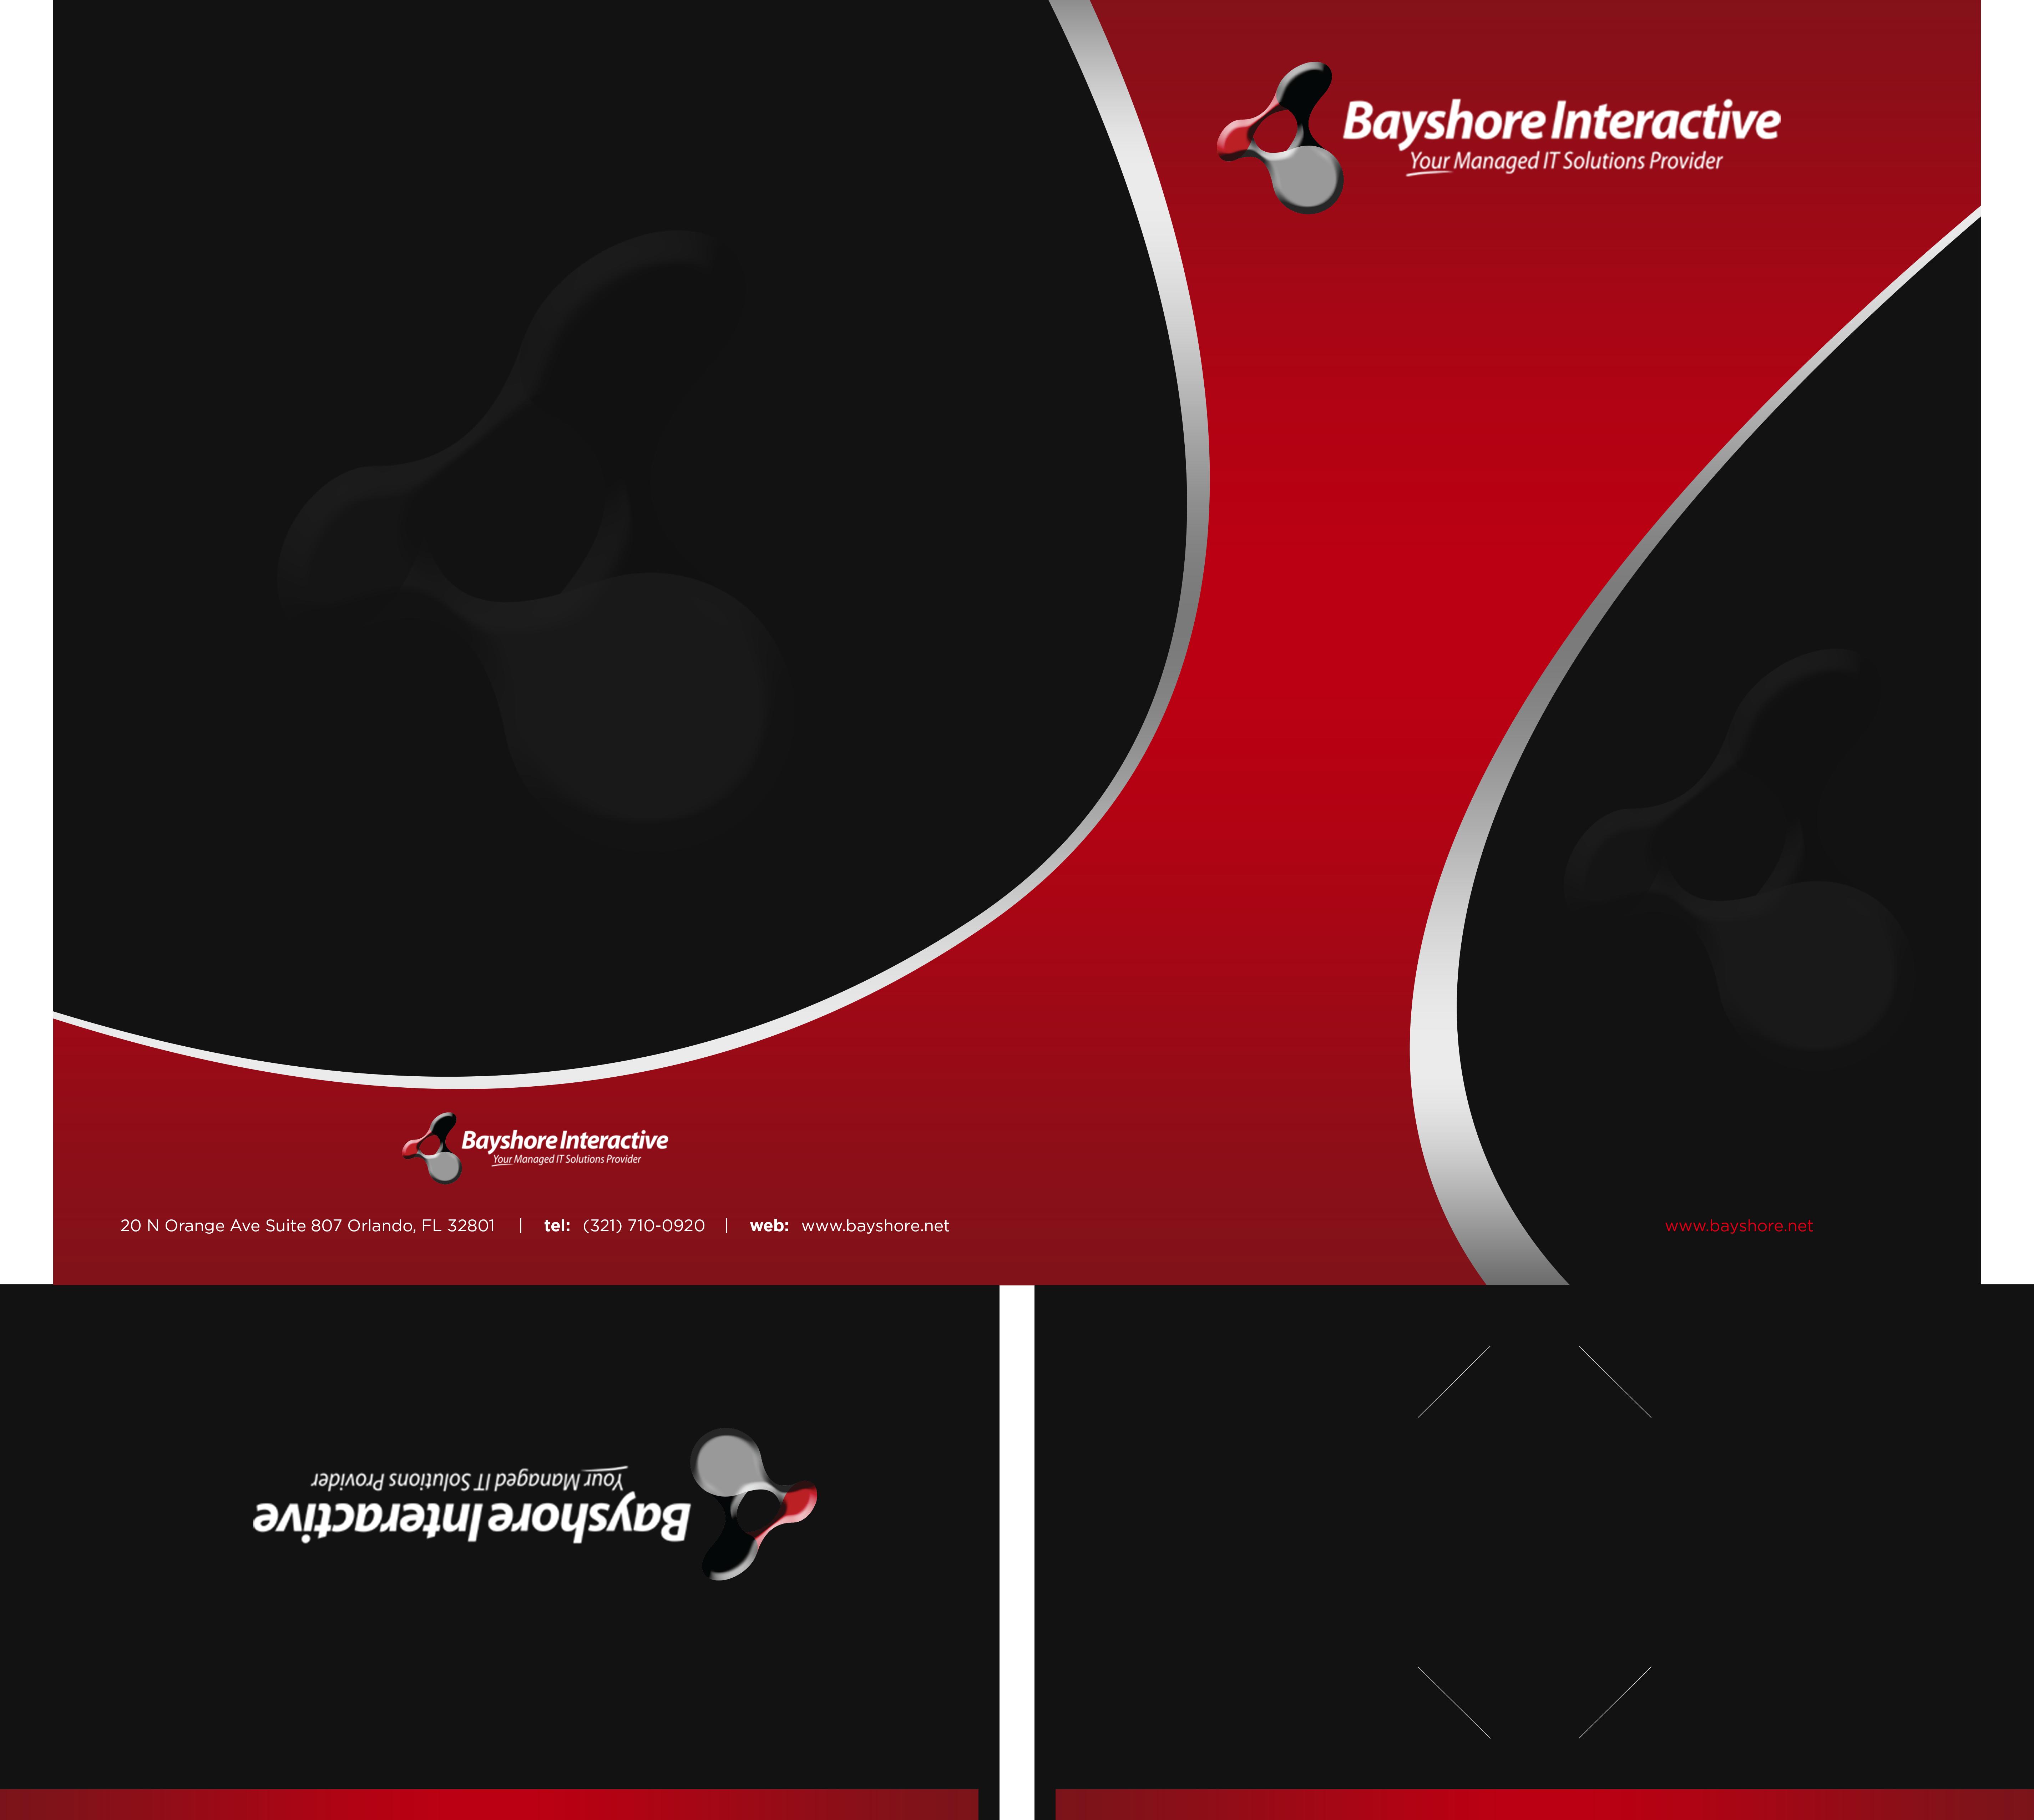 Create Bayshore Interactive's New Marketing Folder!